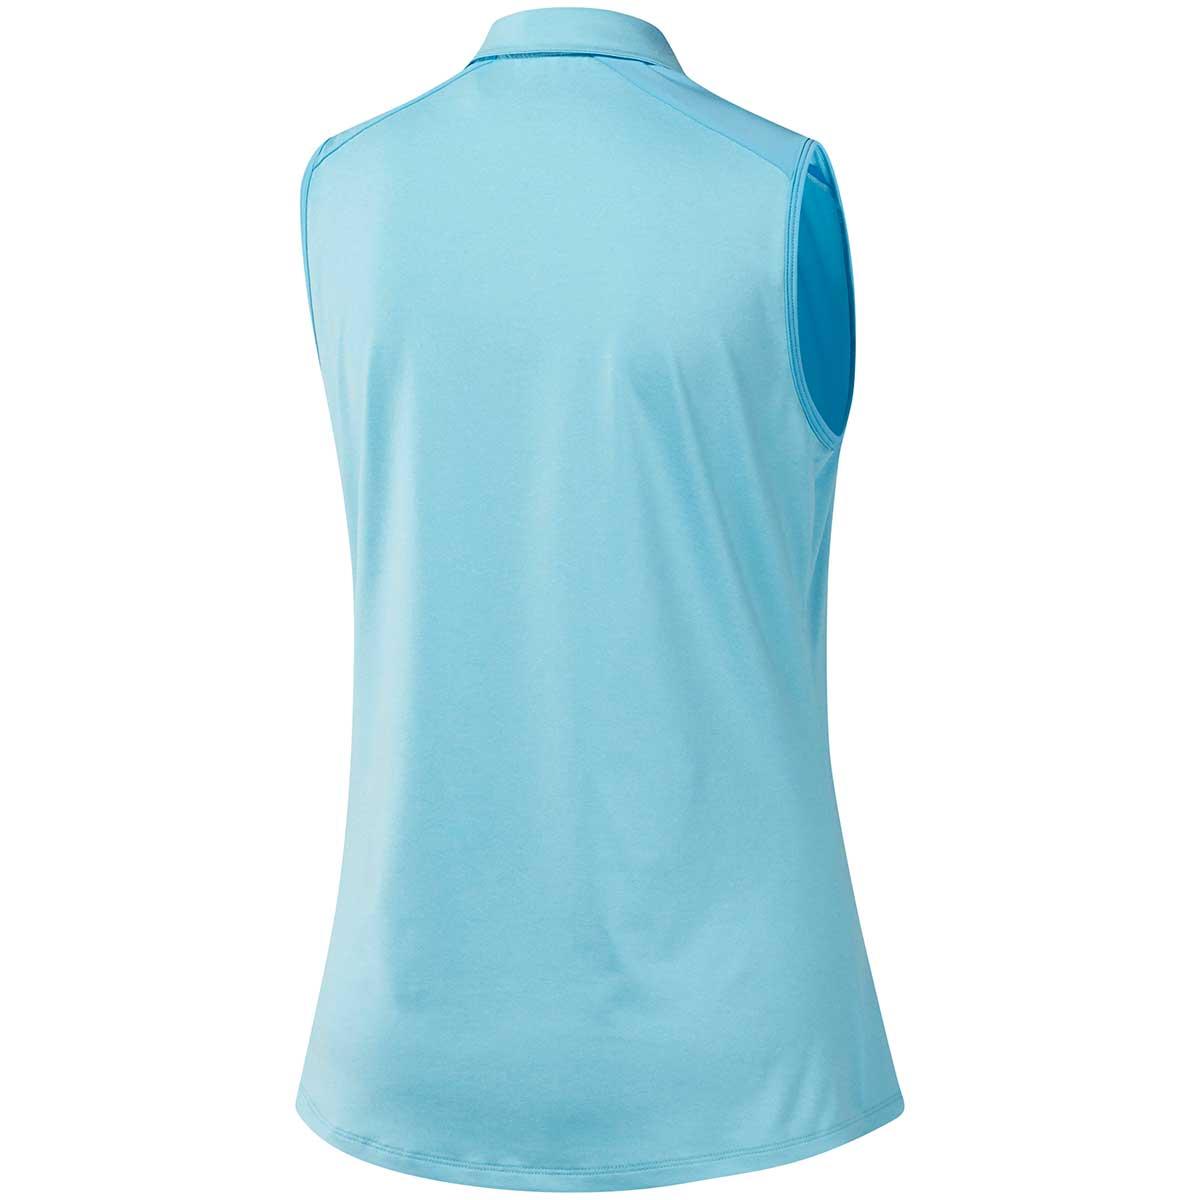 Adidas Women's Ultimate365 Sleeveless Polo Shirt - Aero Blue